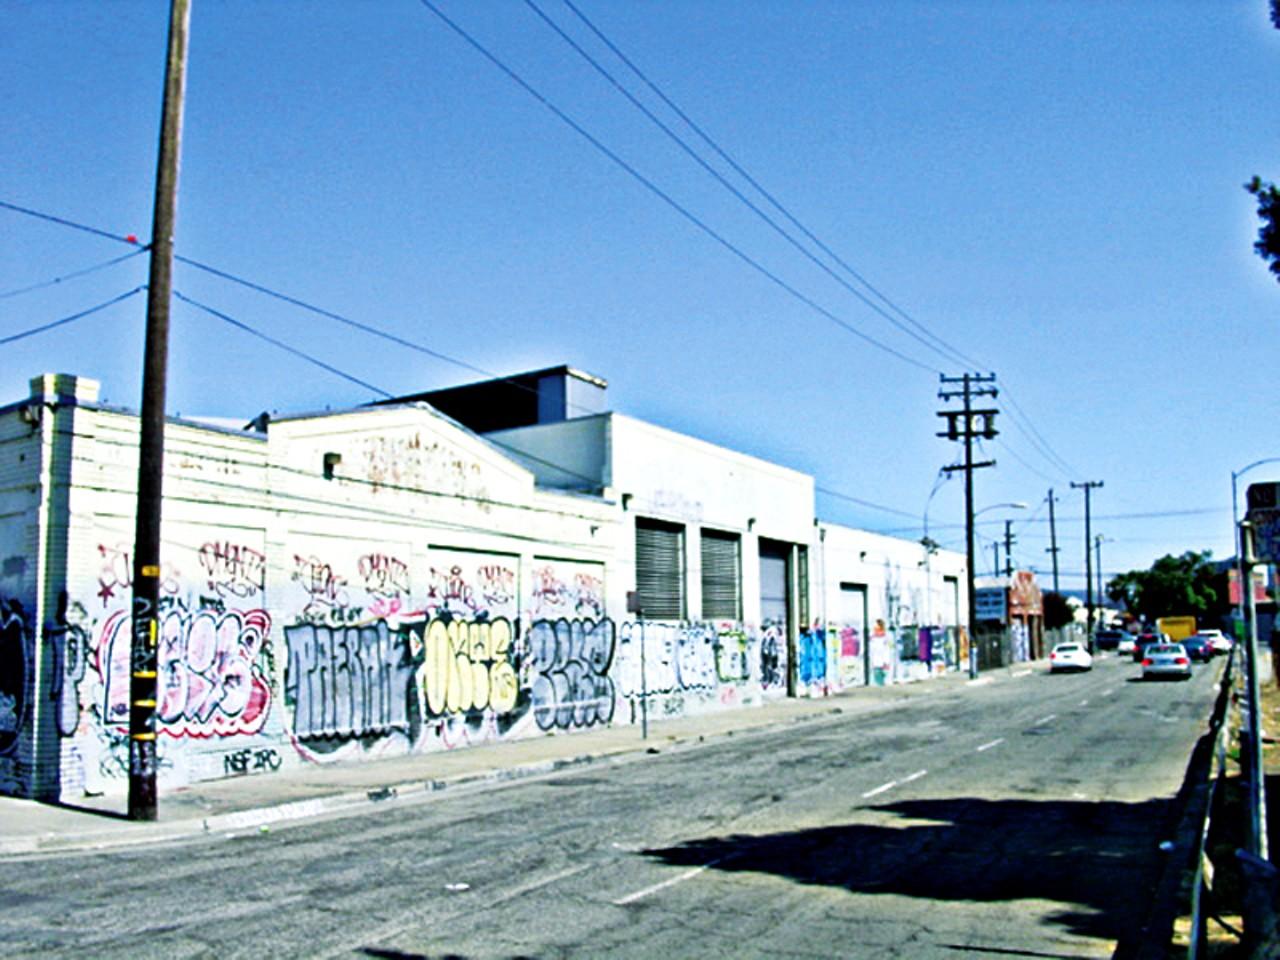 graffiti and gender essay